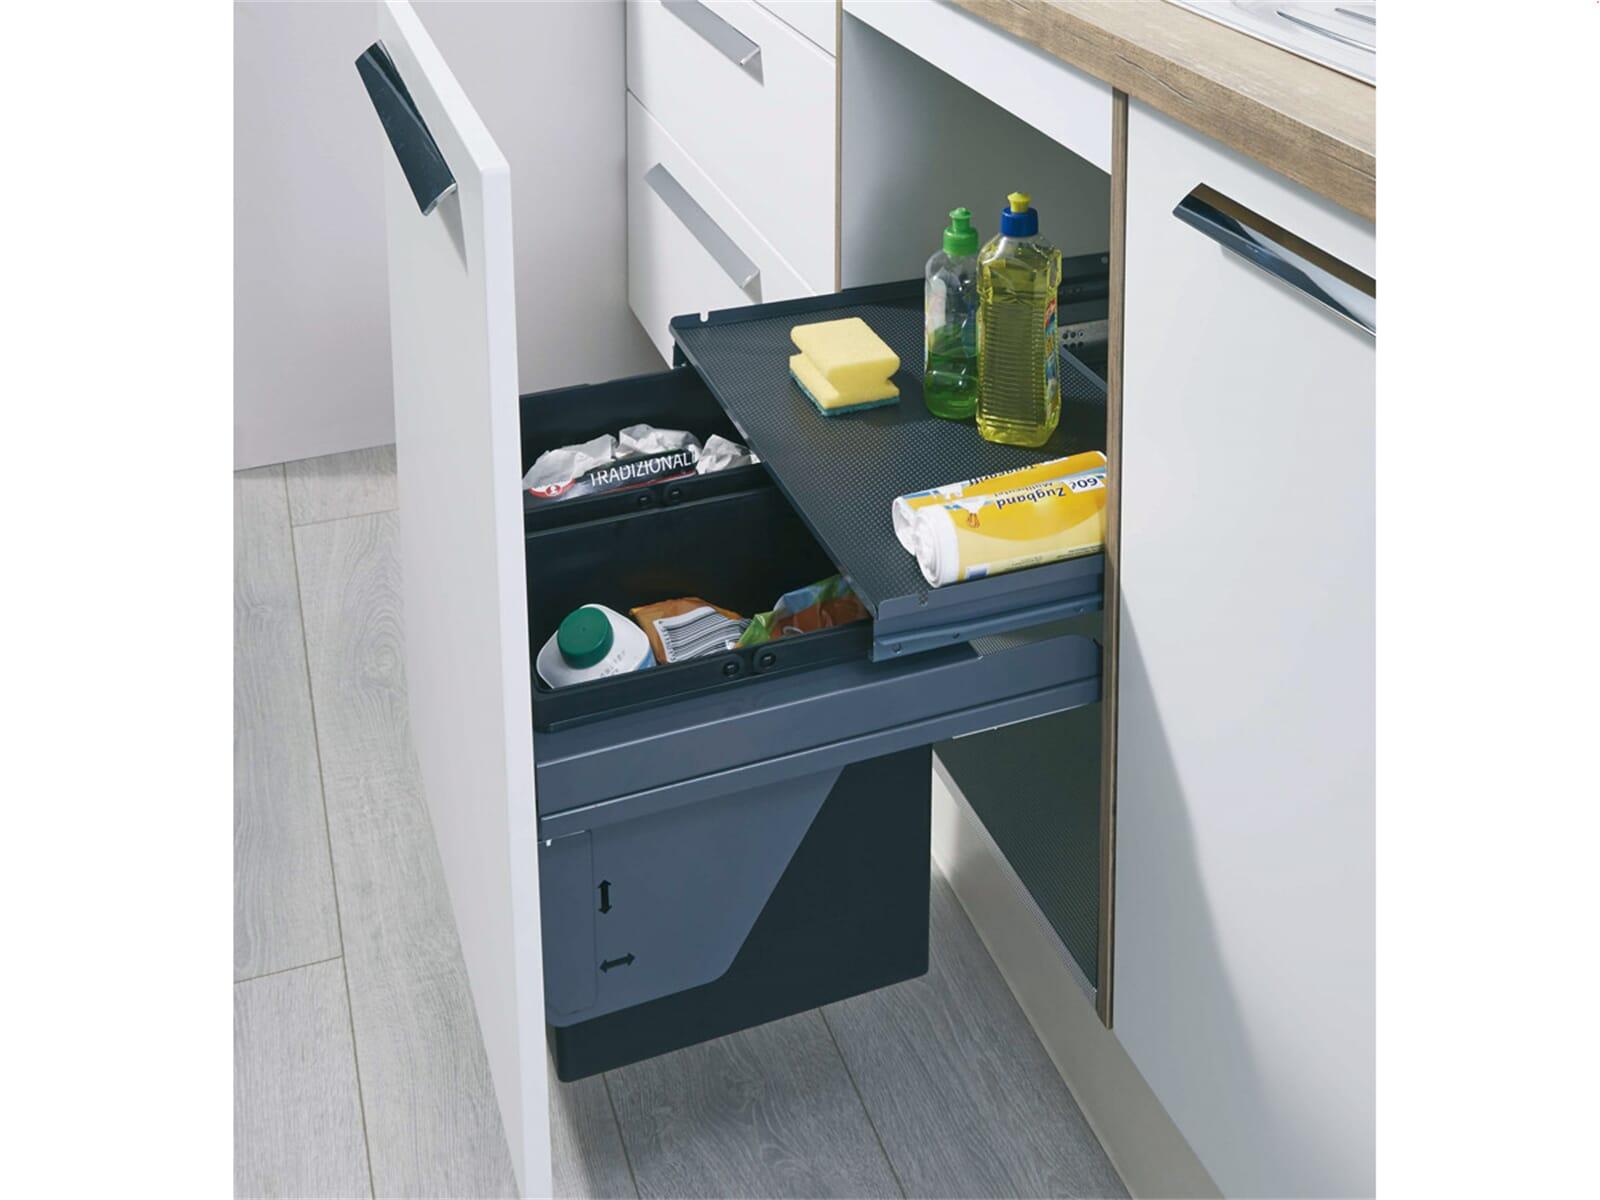 wesco sortomaxx 840607 60 einbau abfallsammler. Black Bedroom Furniture Sets. Home Design Ideas